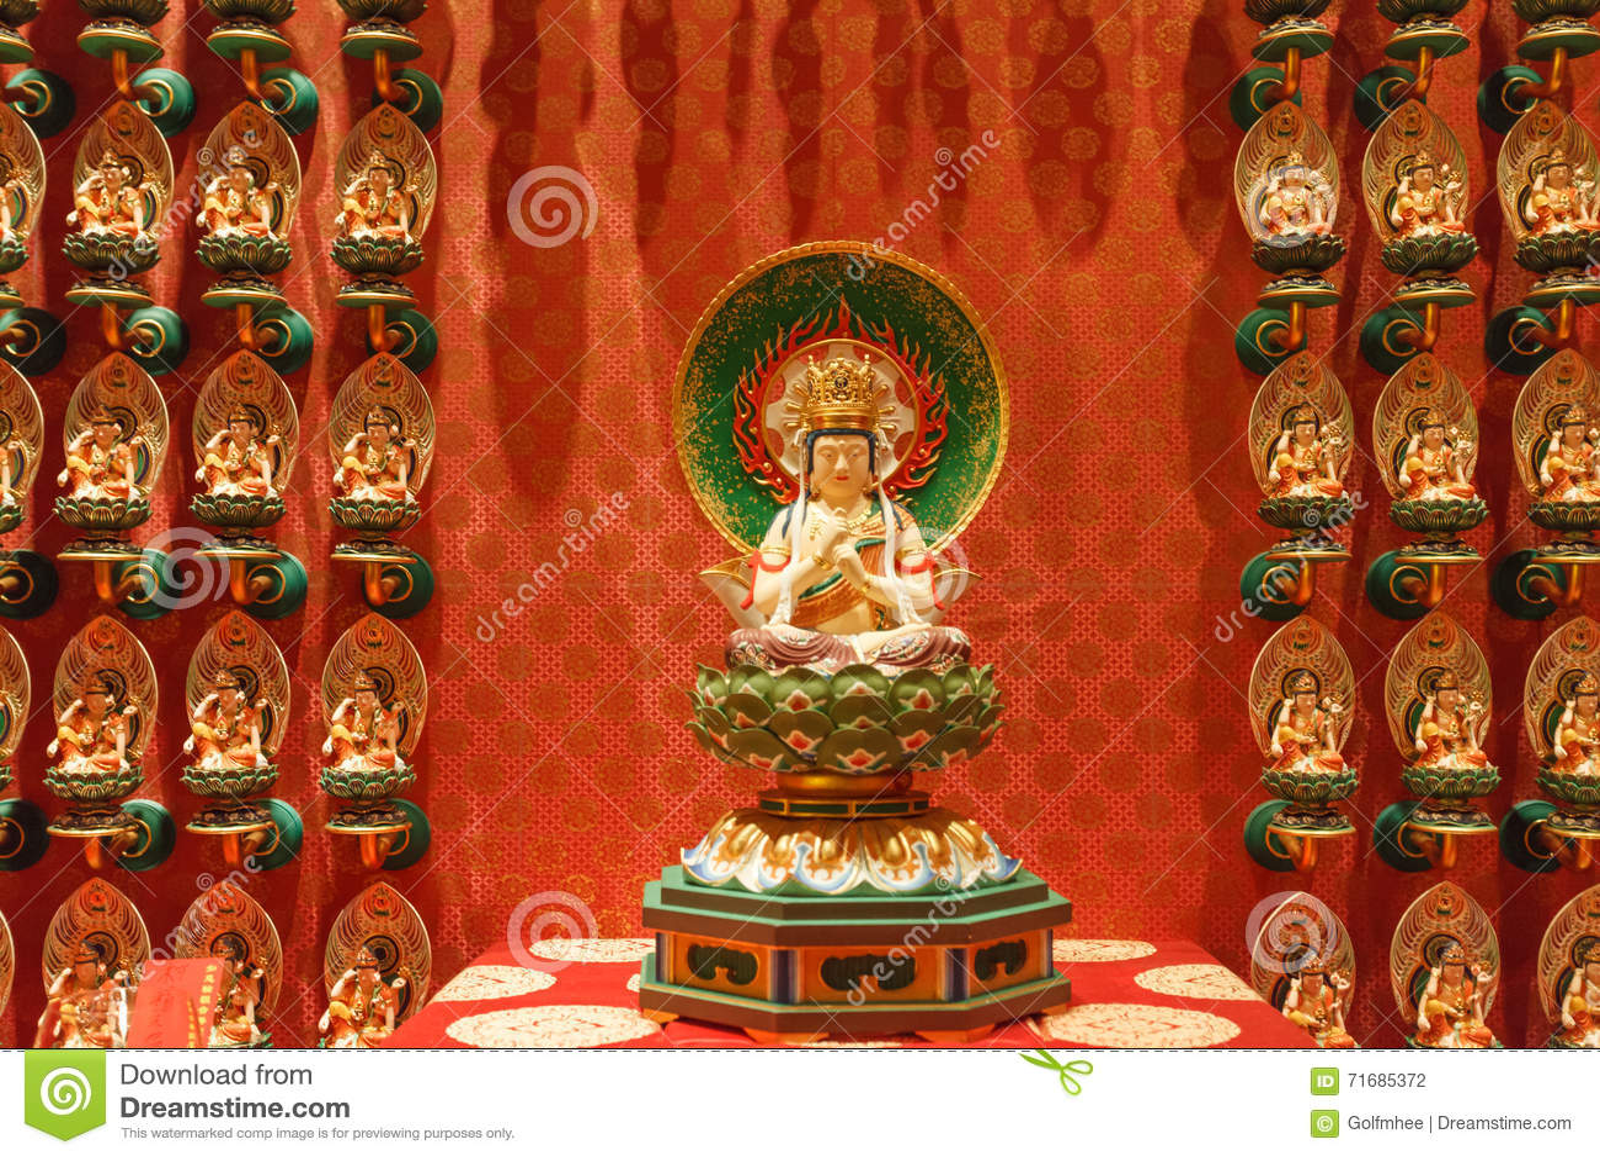 SINGAPORE/SINGAPORE - 27 ΜΑΡΤΊΟΥ 2014: Κόκκινος κινεζικός ναός, Βούδας